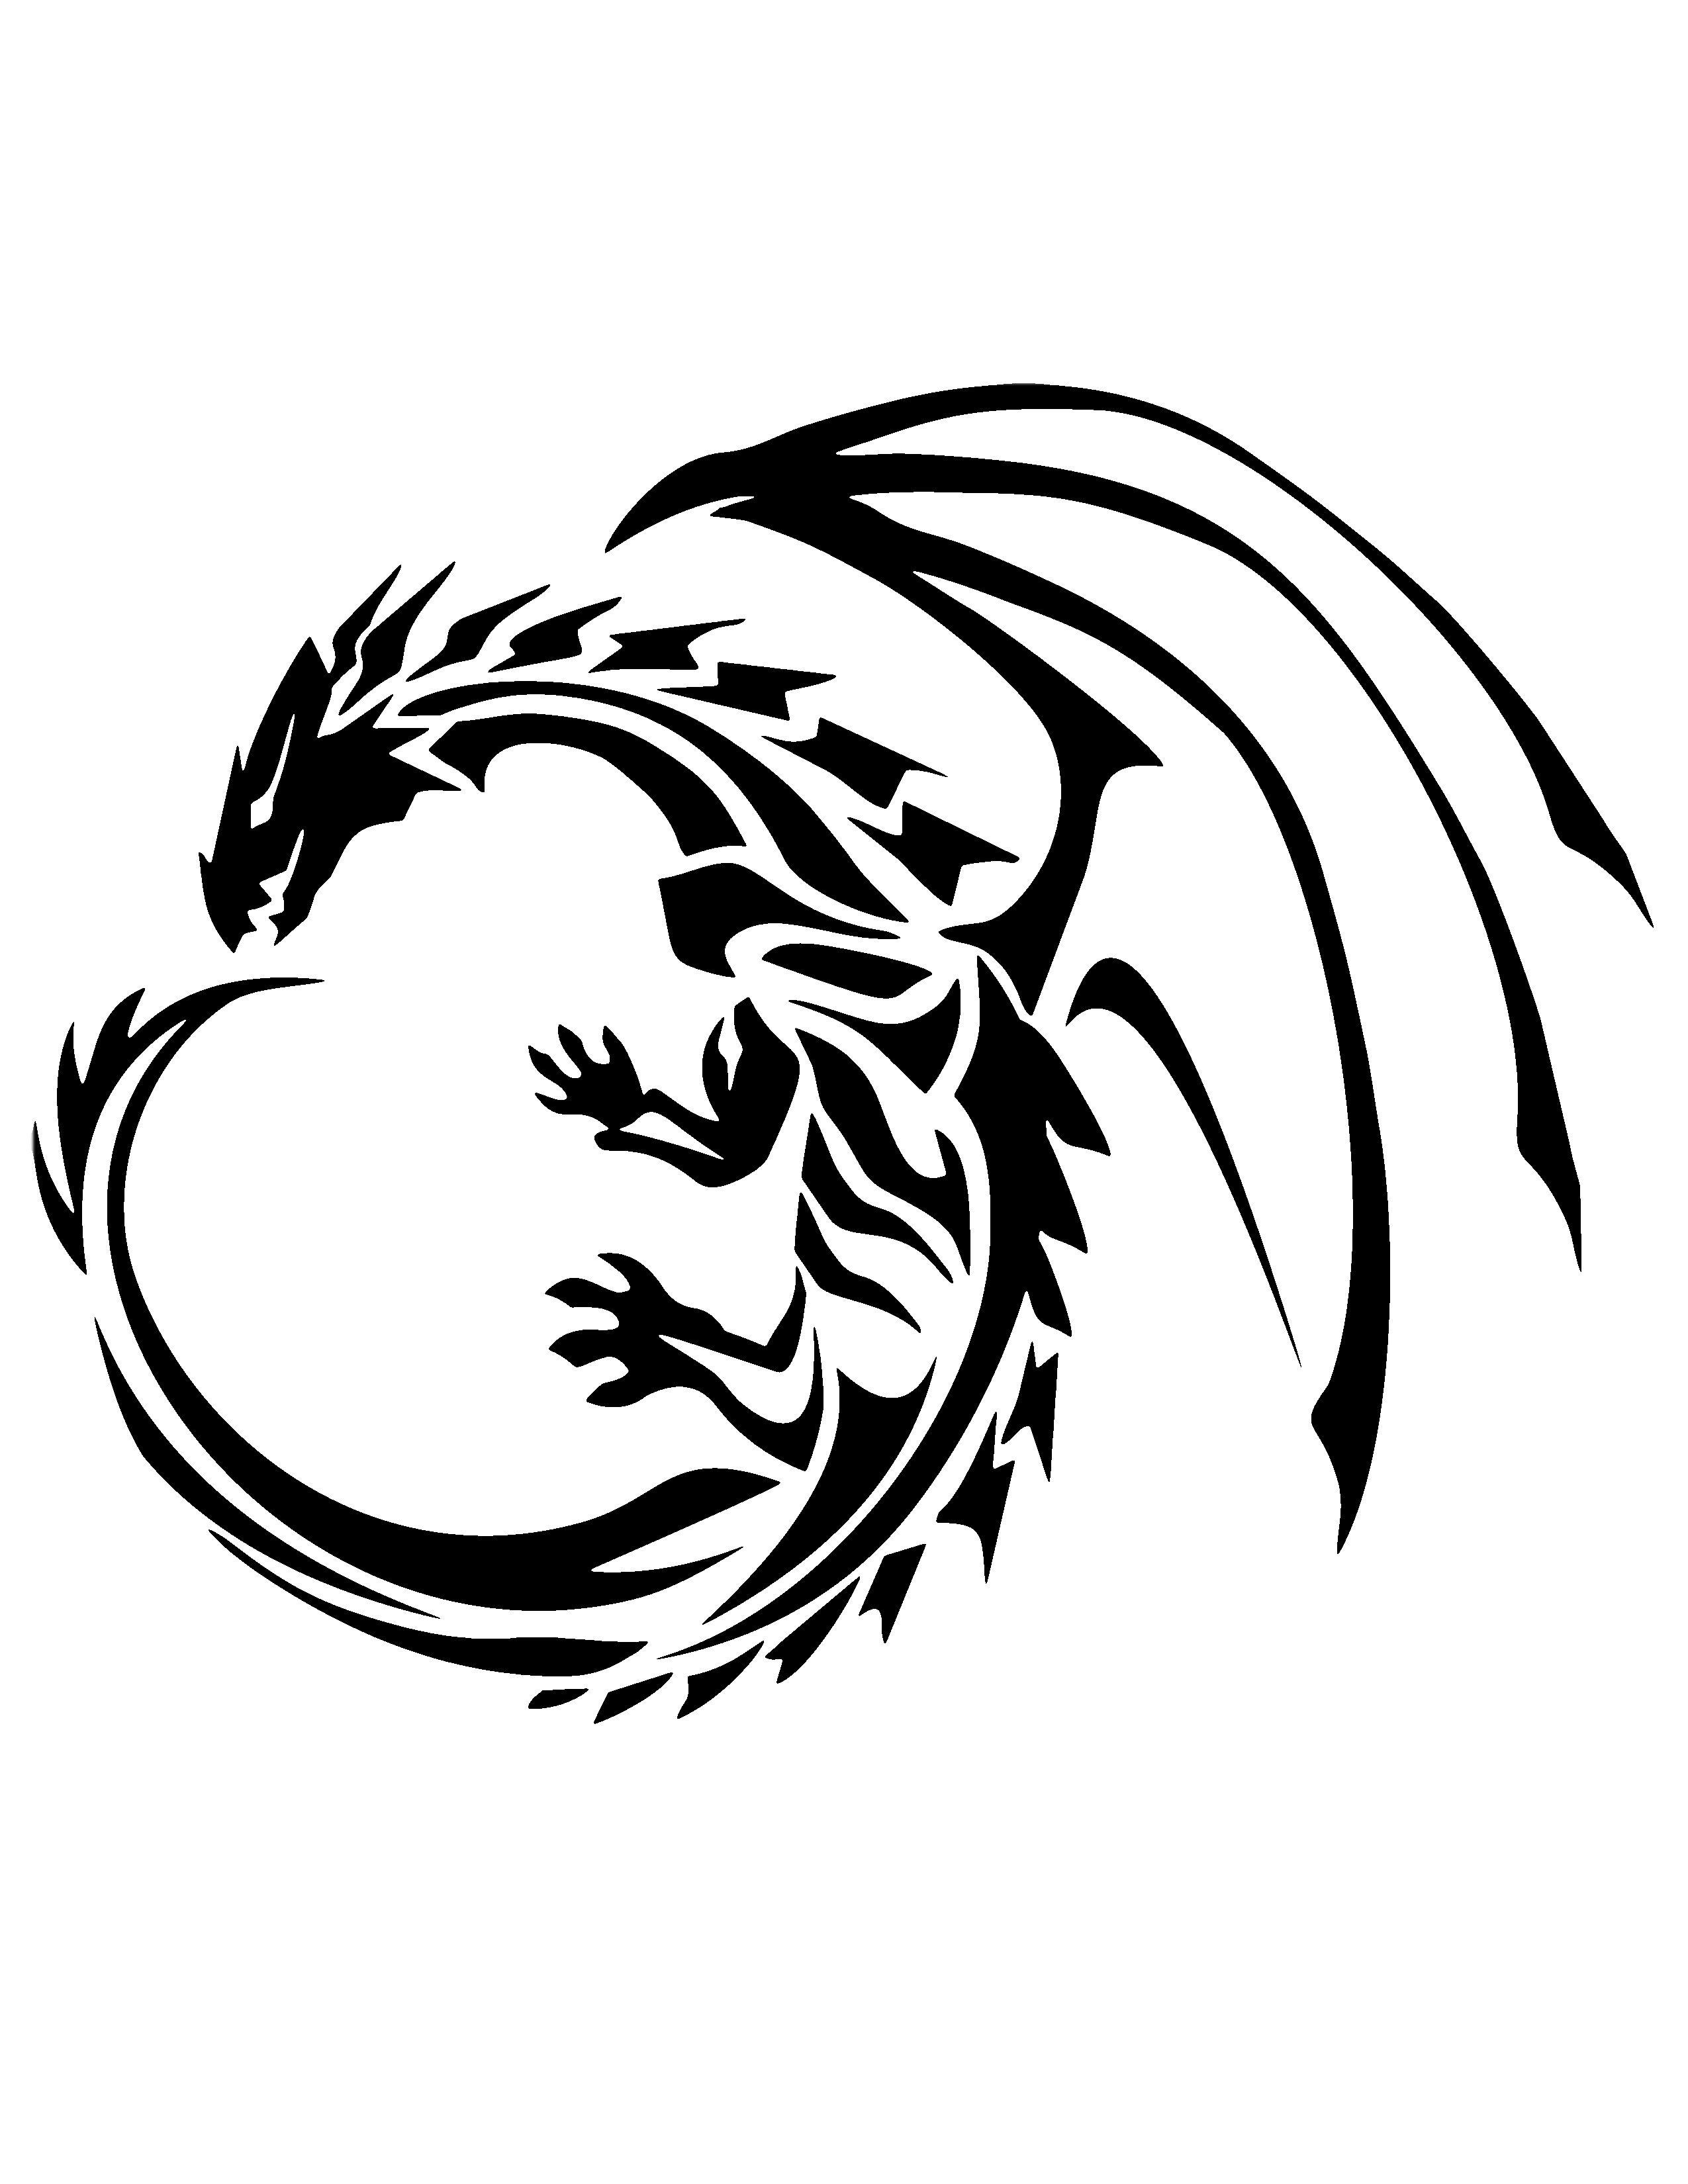 Dragon Stencil | Stencils | Tribal Dragon Tattoos, Chinese Dragon - Free Printable Dragon Stencils